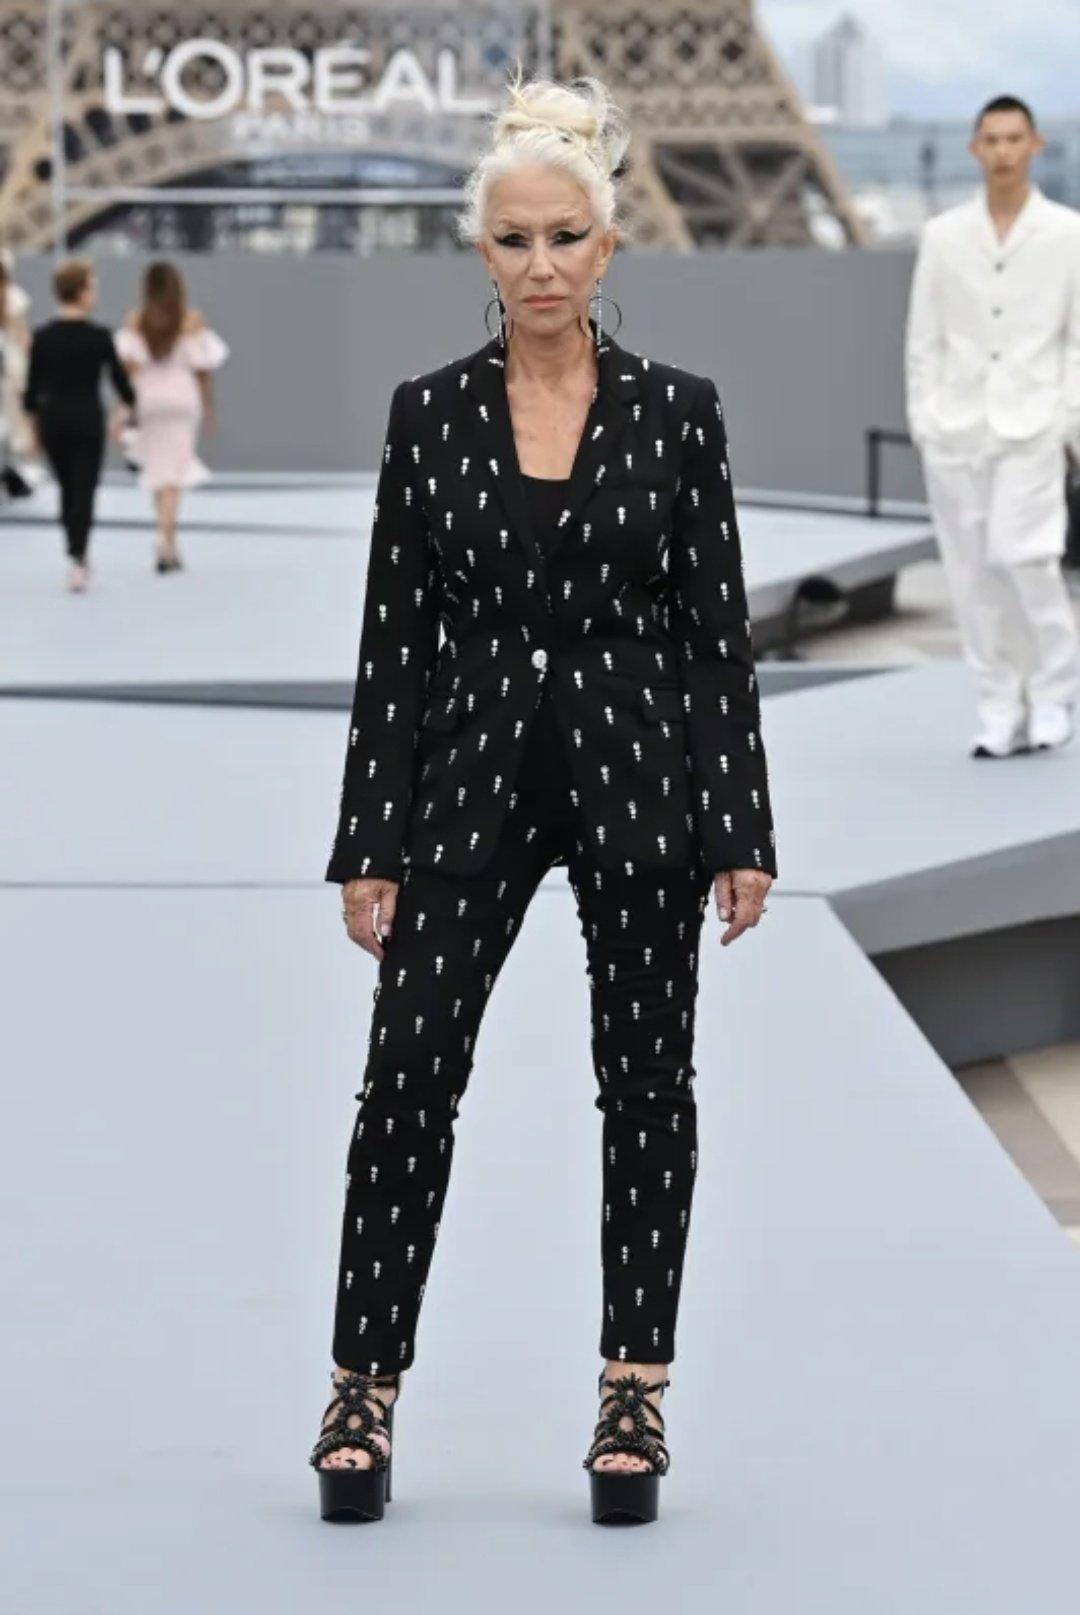 L'Oreal catwalk - Paris Fashion Week